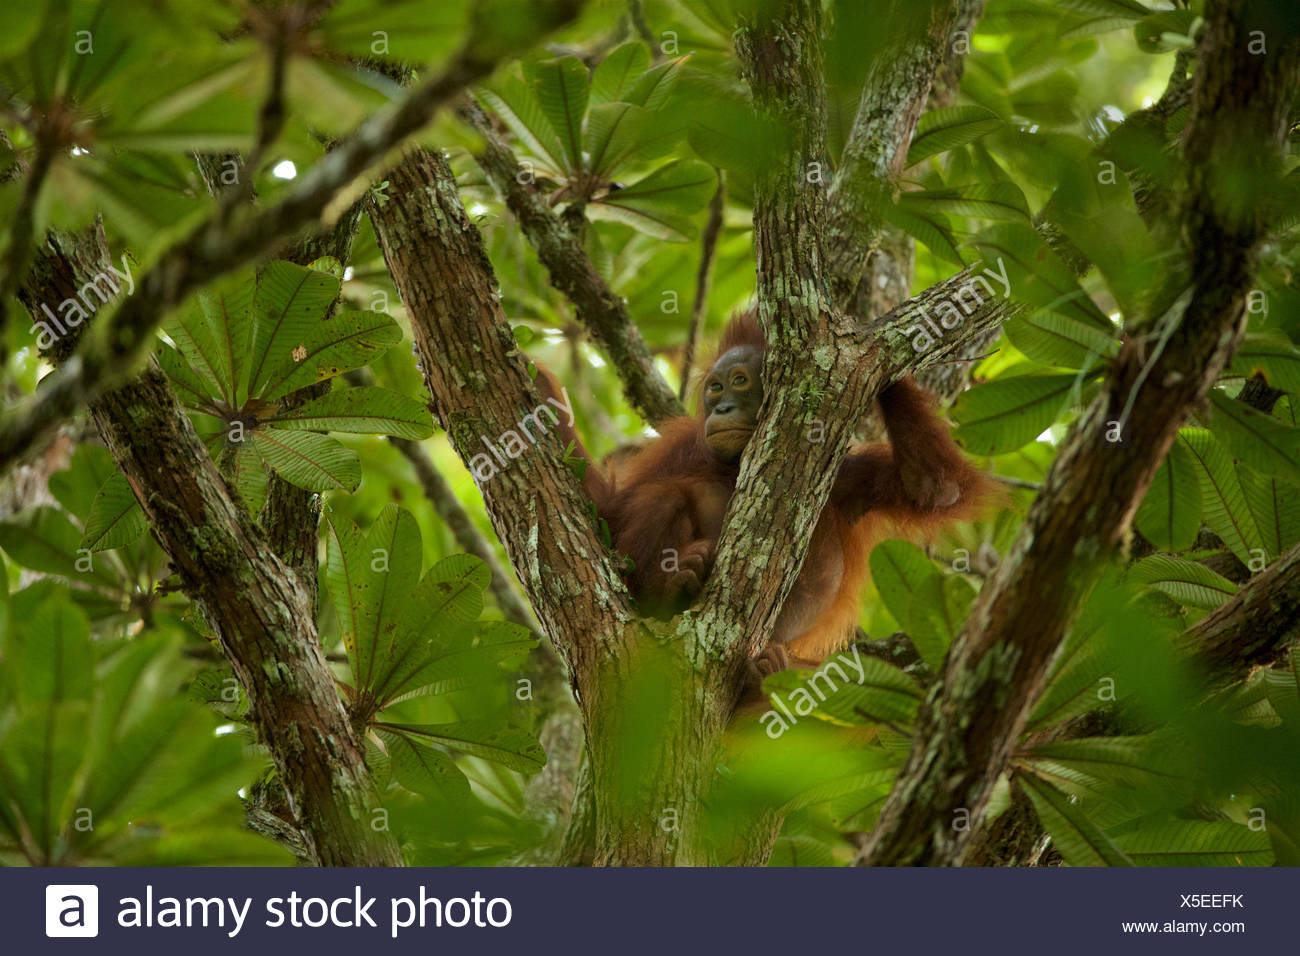 A juvenile orangutan, Pongo pygmaeus wurmbii, rests in a tree in Gunung Palung National Park. - Stock Image